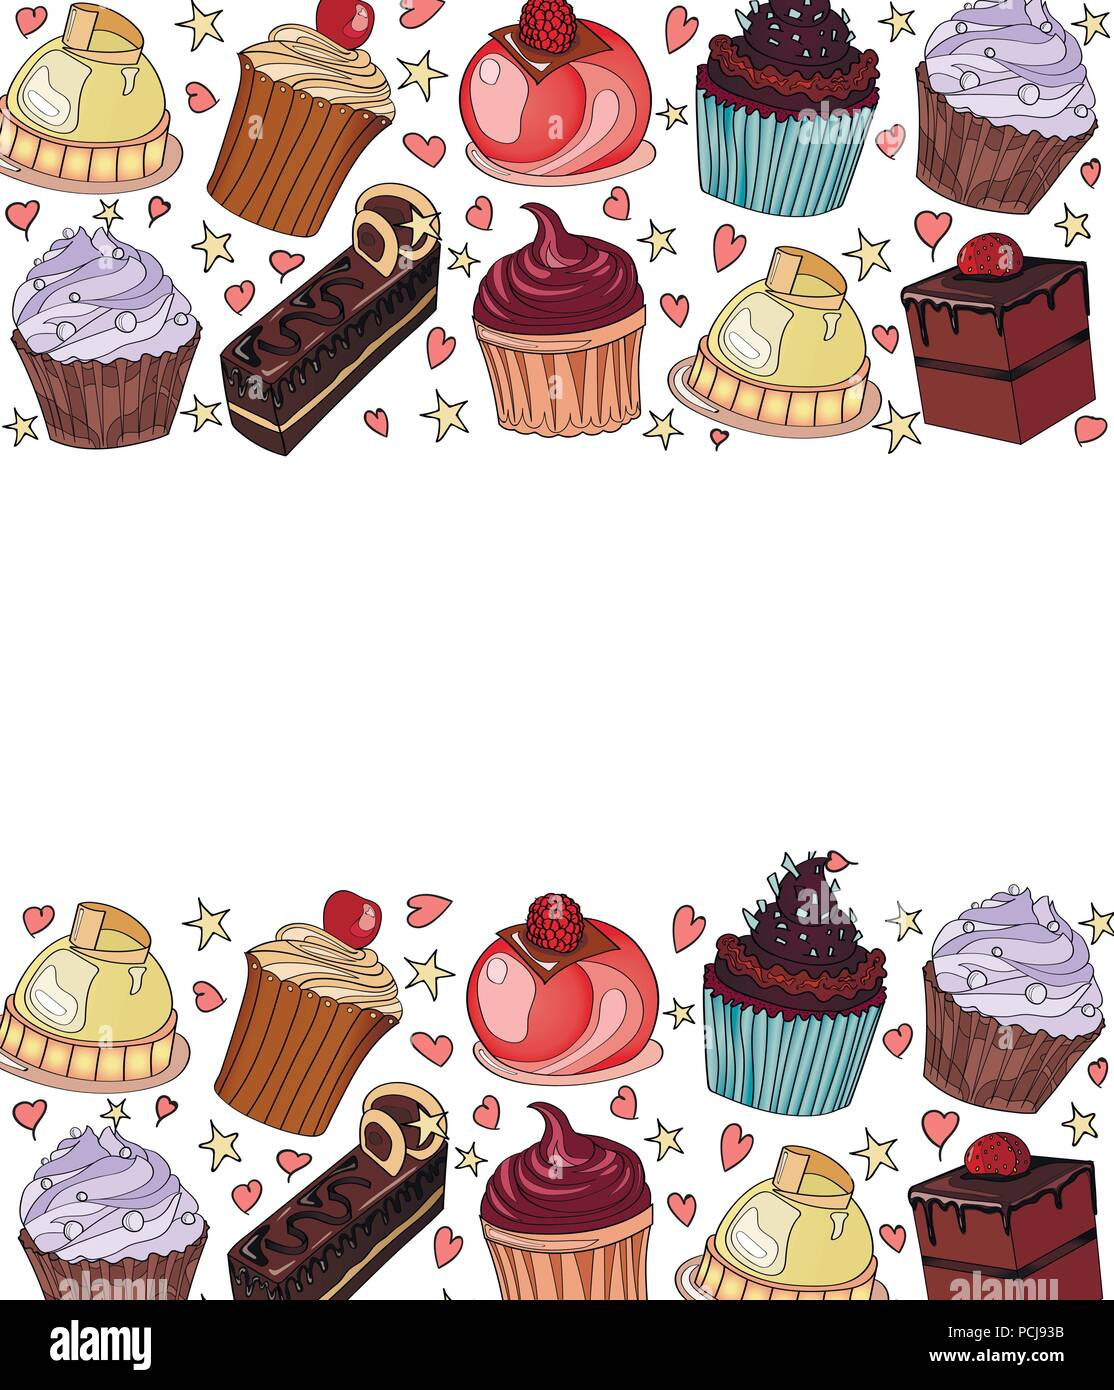 Marble Coffee Table Tesco: Bakery Shop Cakes Stock Photos & Bakery Shop Cakes Stock